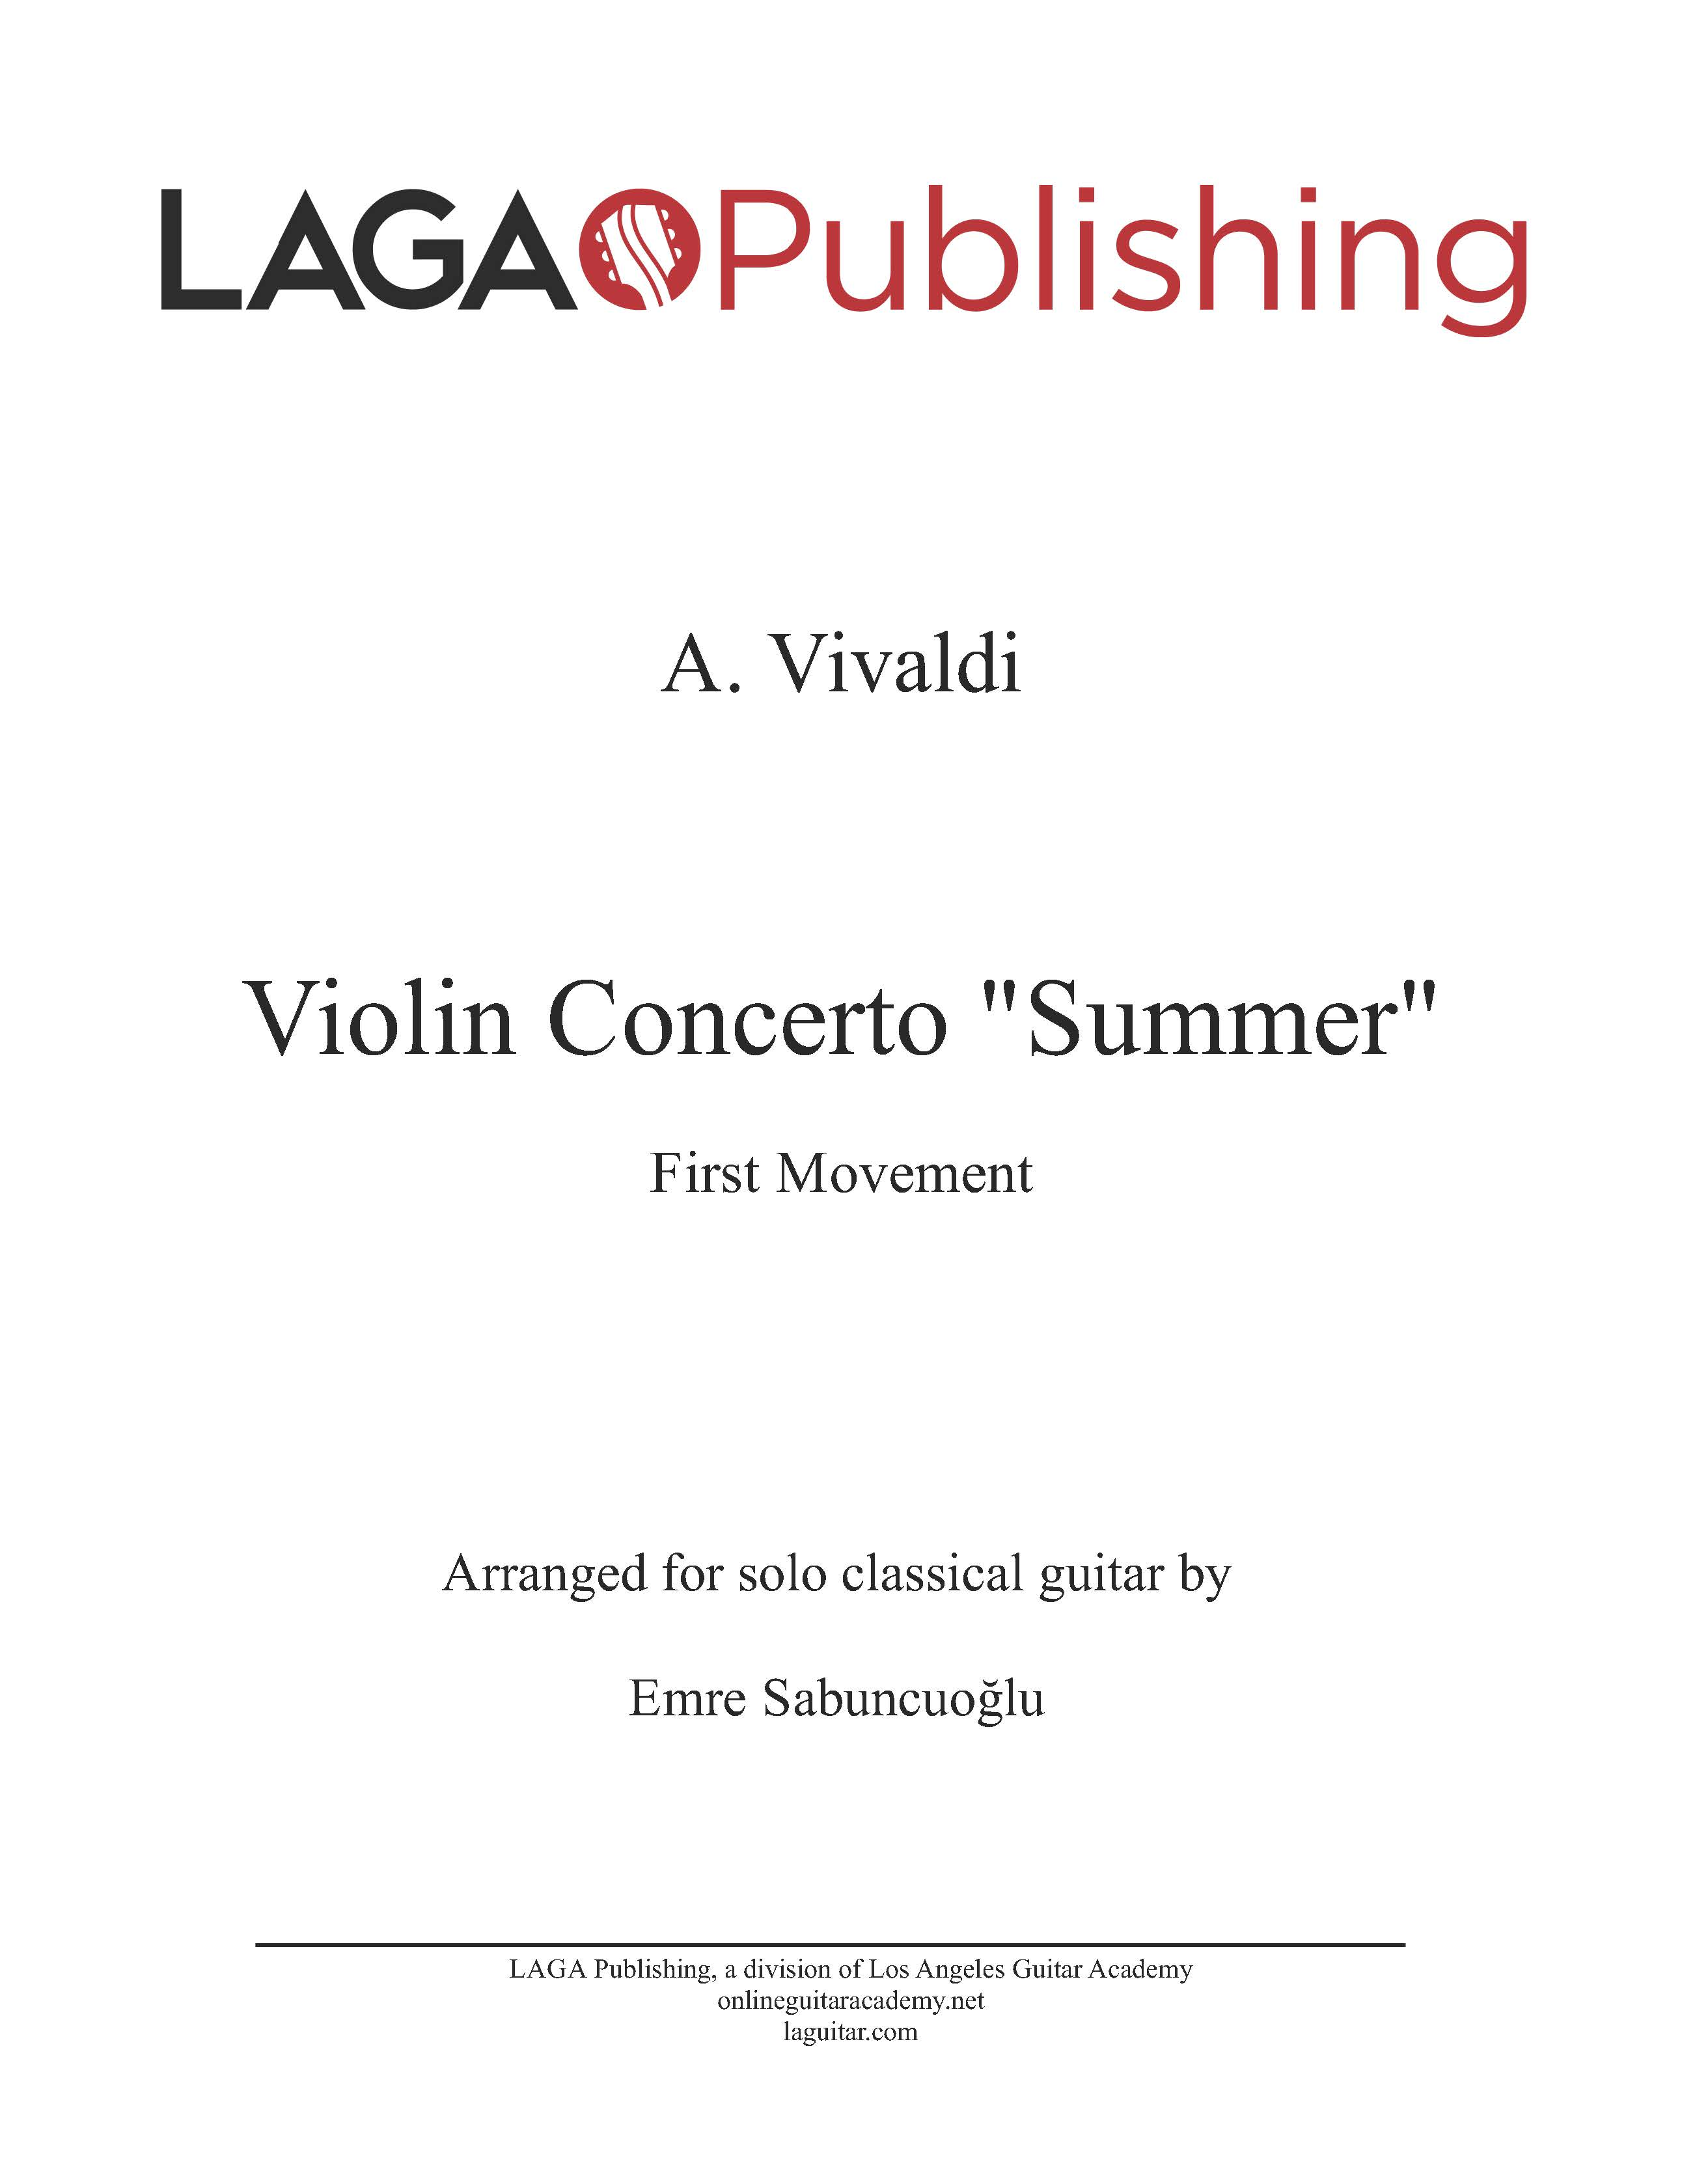 LAGA-Publishing-Vivaldi-4Seasons-Summer-I